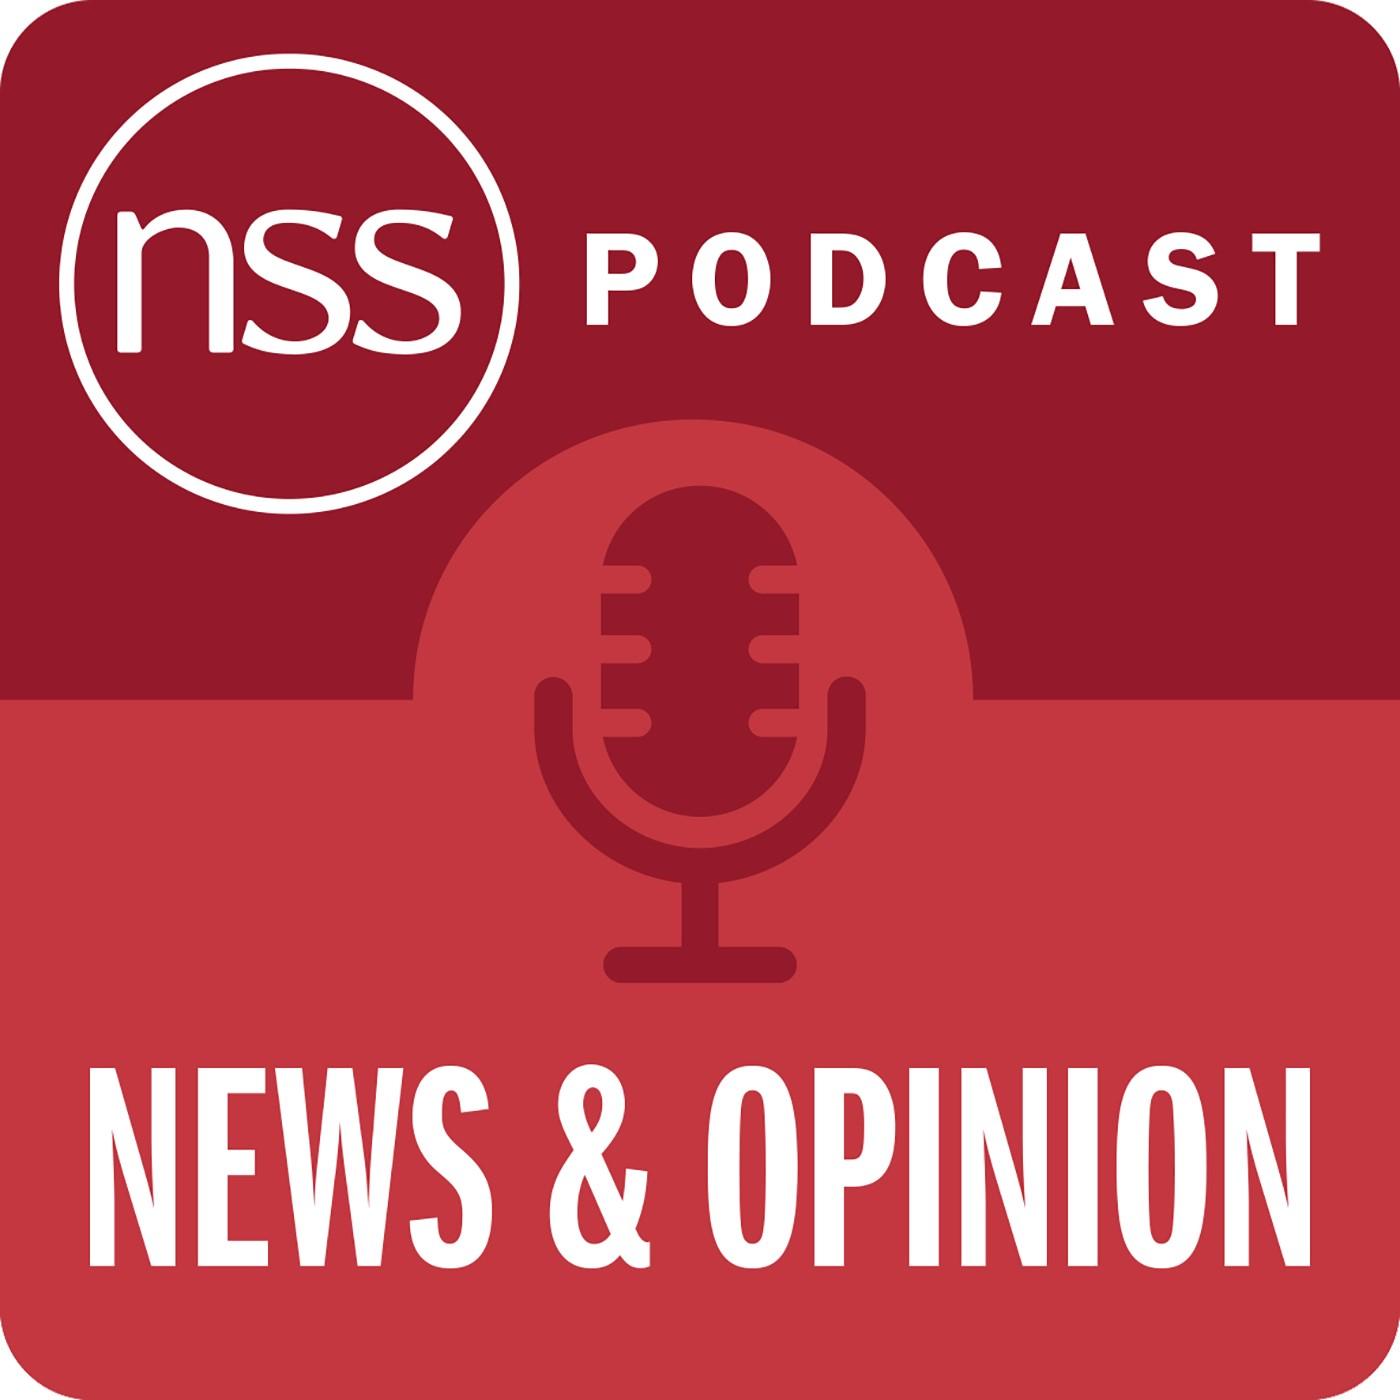 National Secular Society Podcast